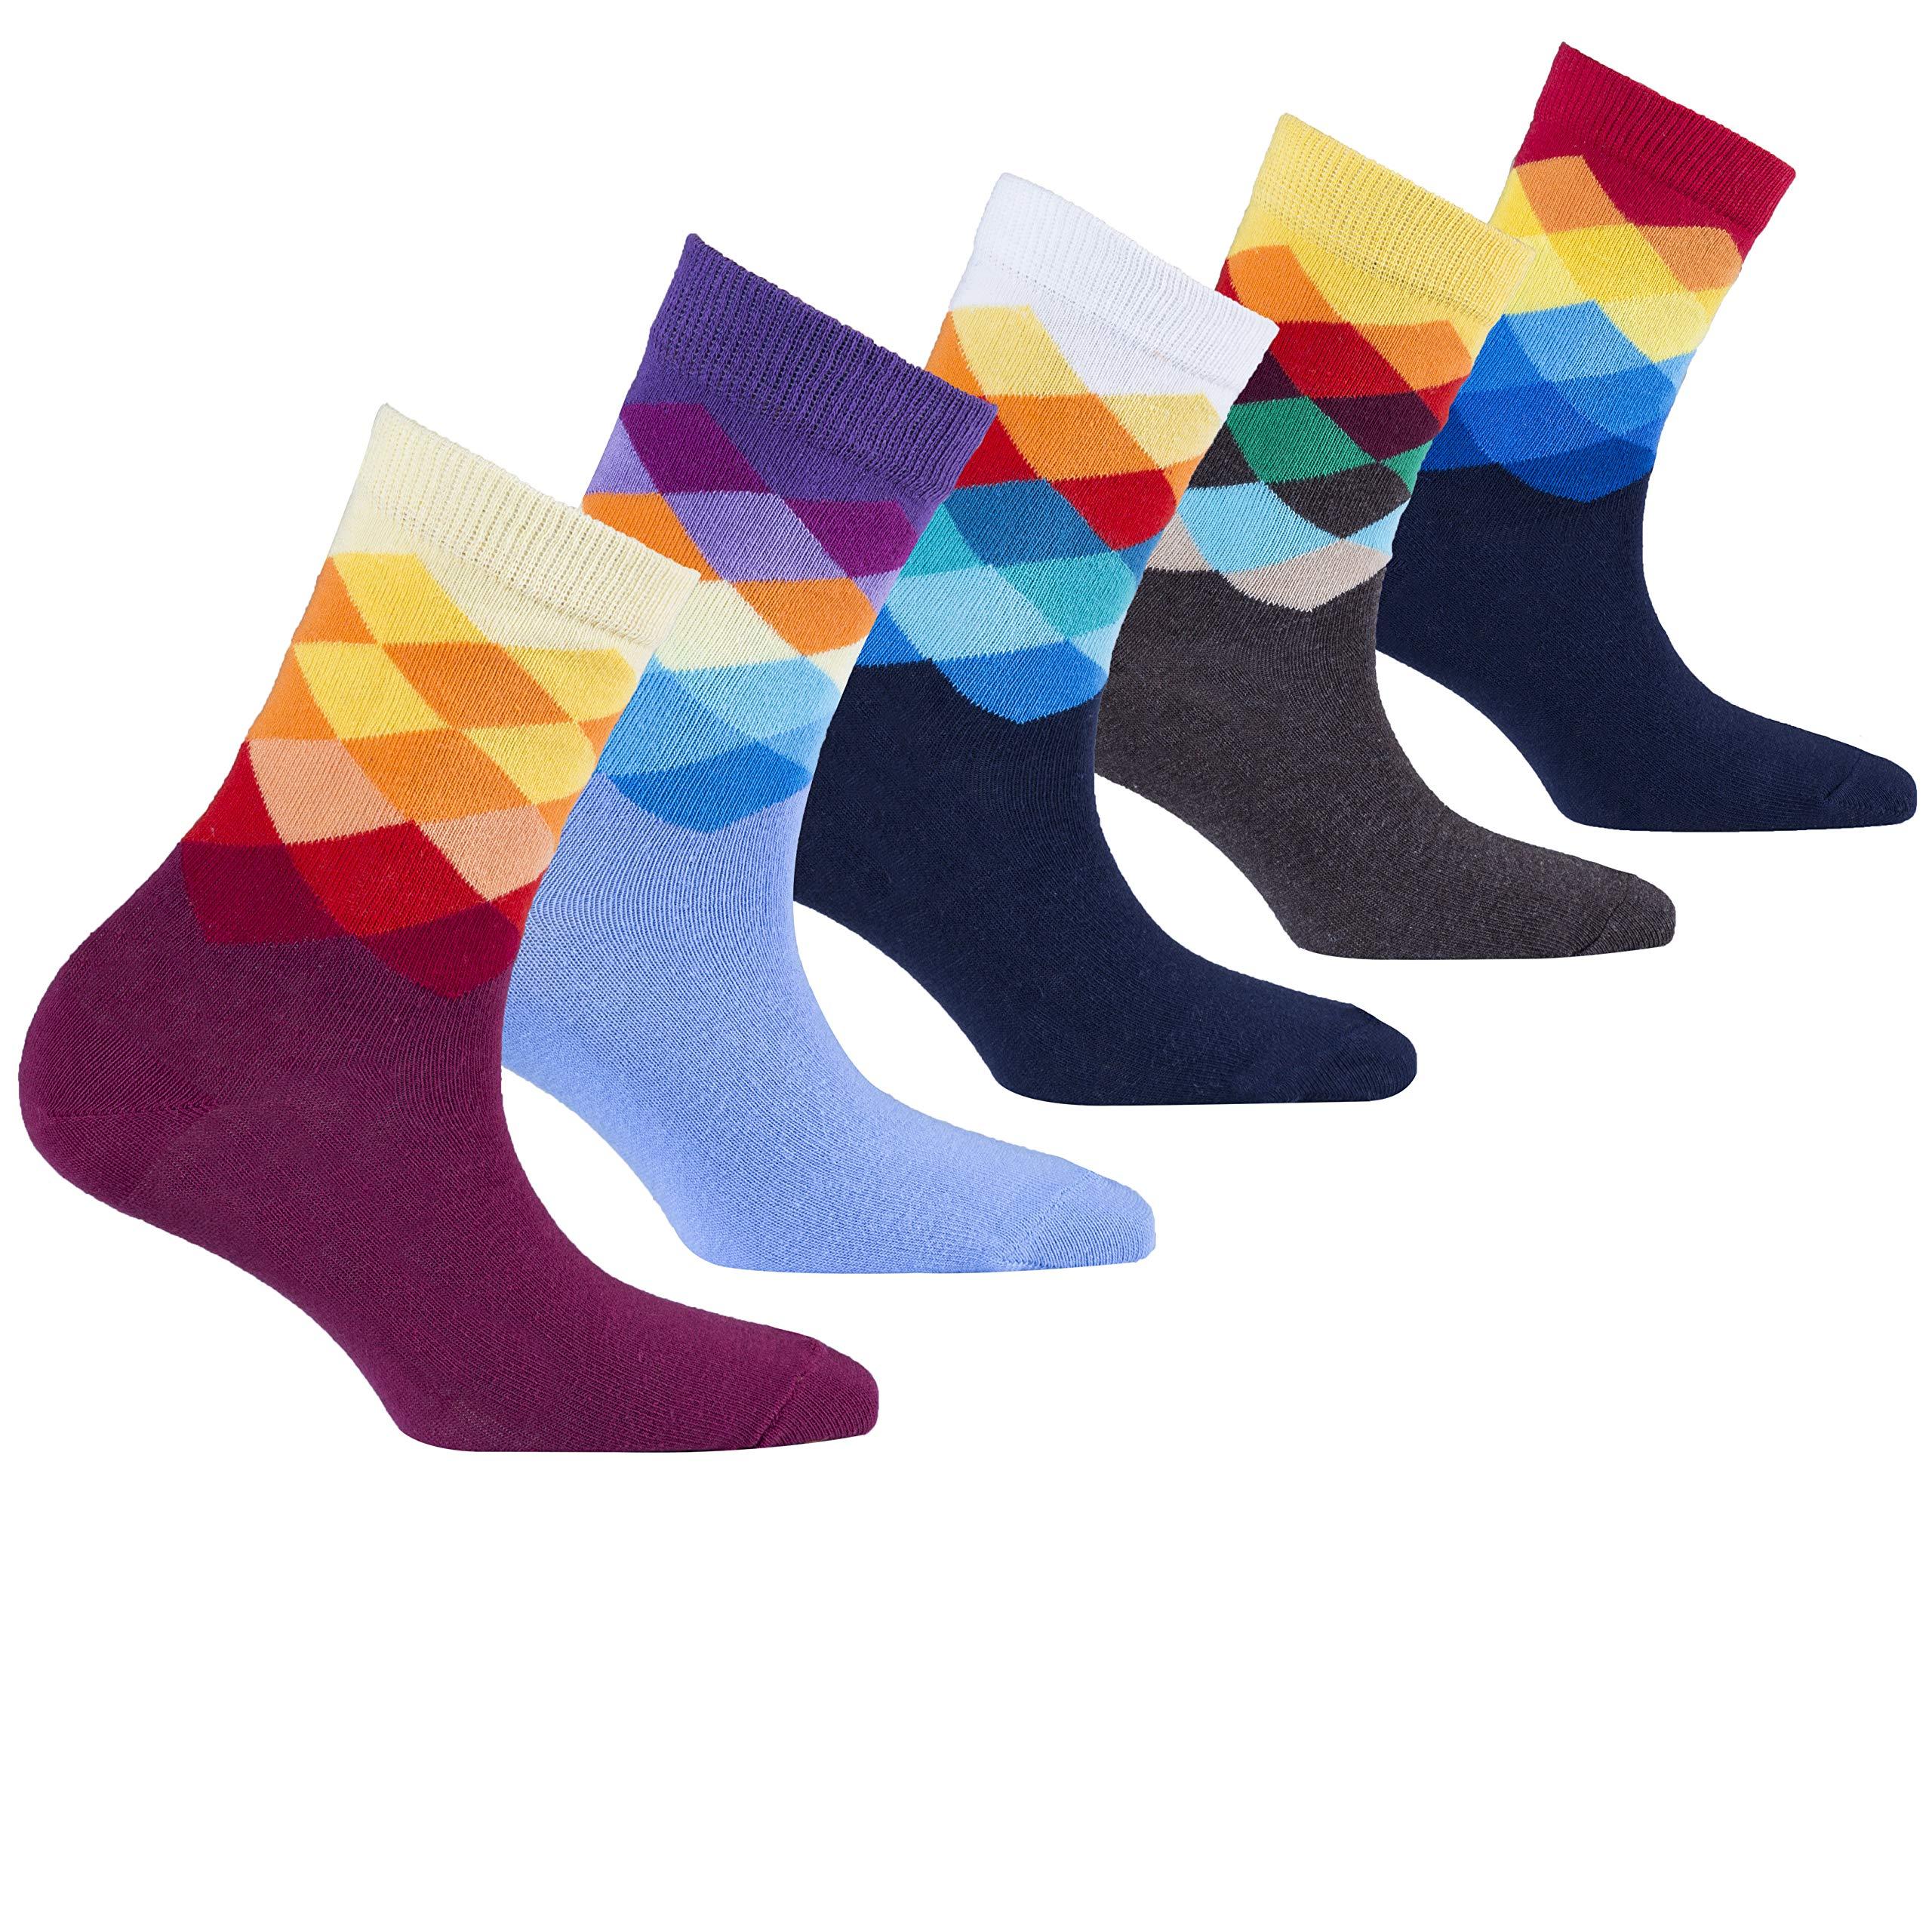 Socks n Socks-Kids 5-pair Fun Cool Cotton Colorful Diamond Socks Gift Box-Large